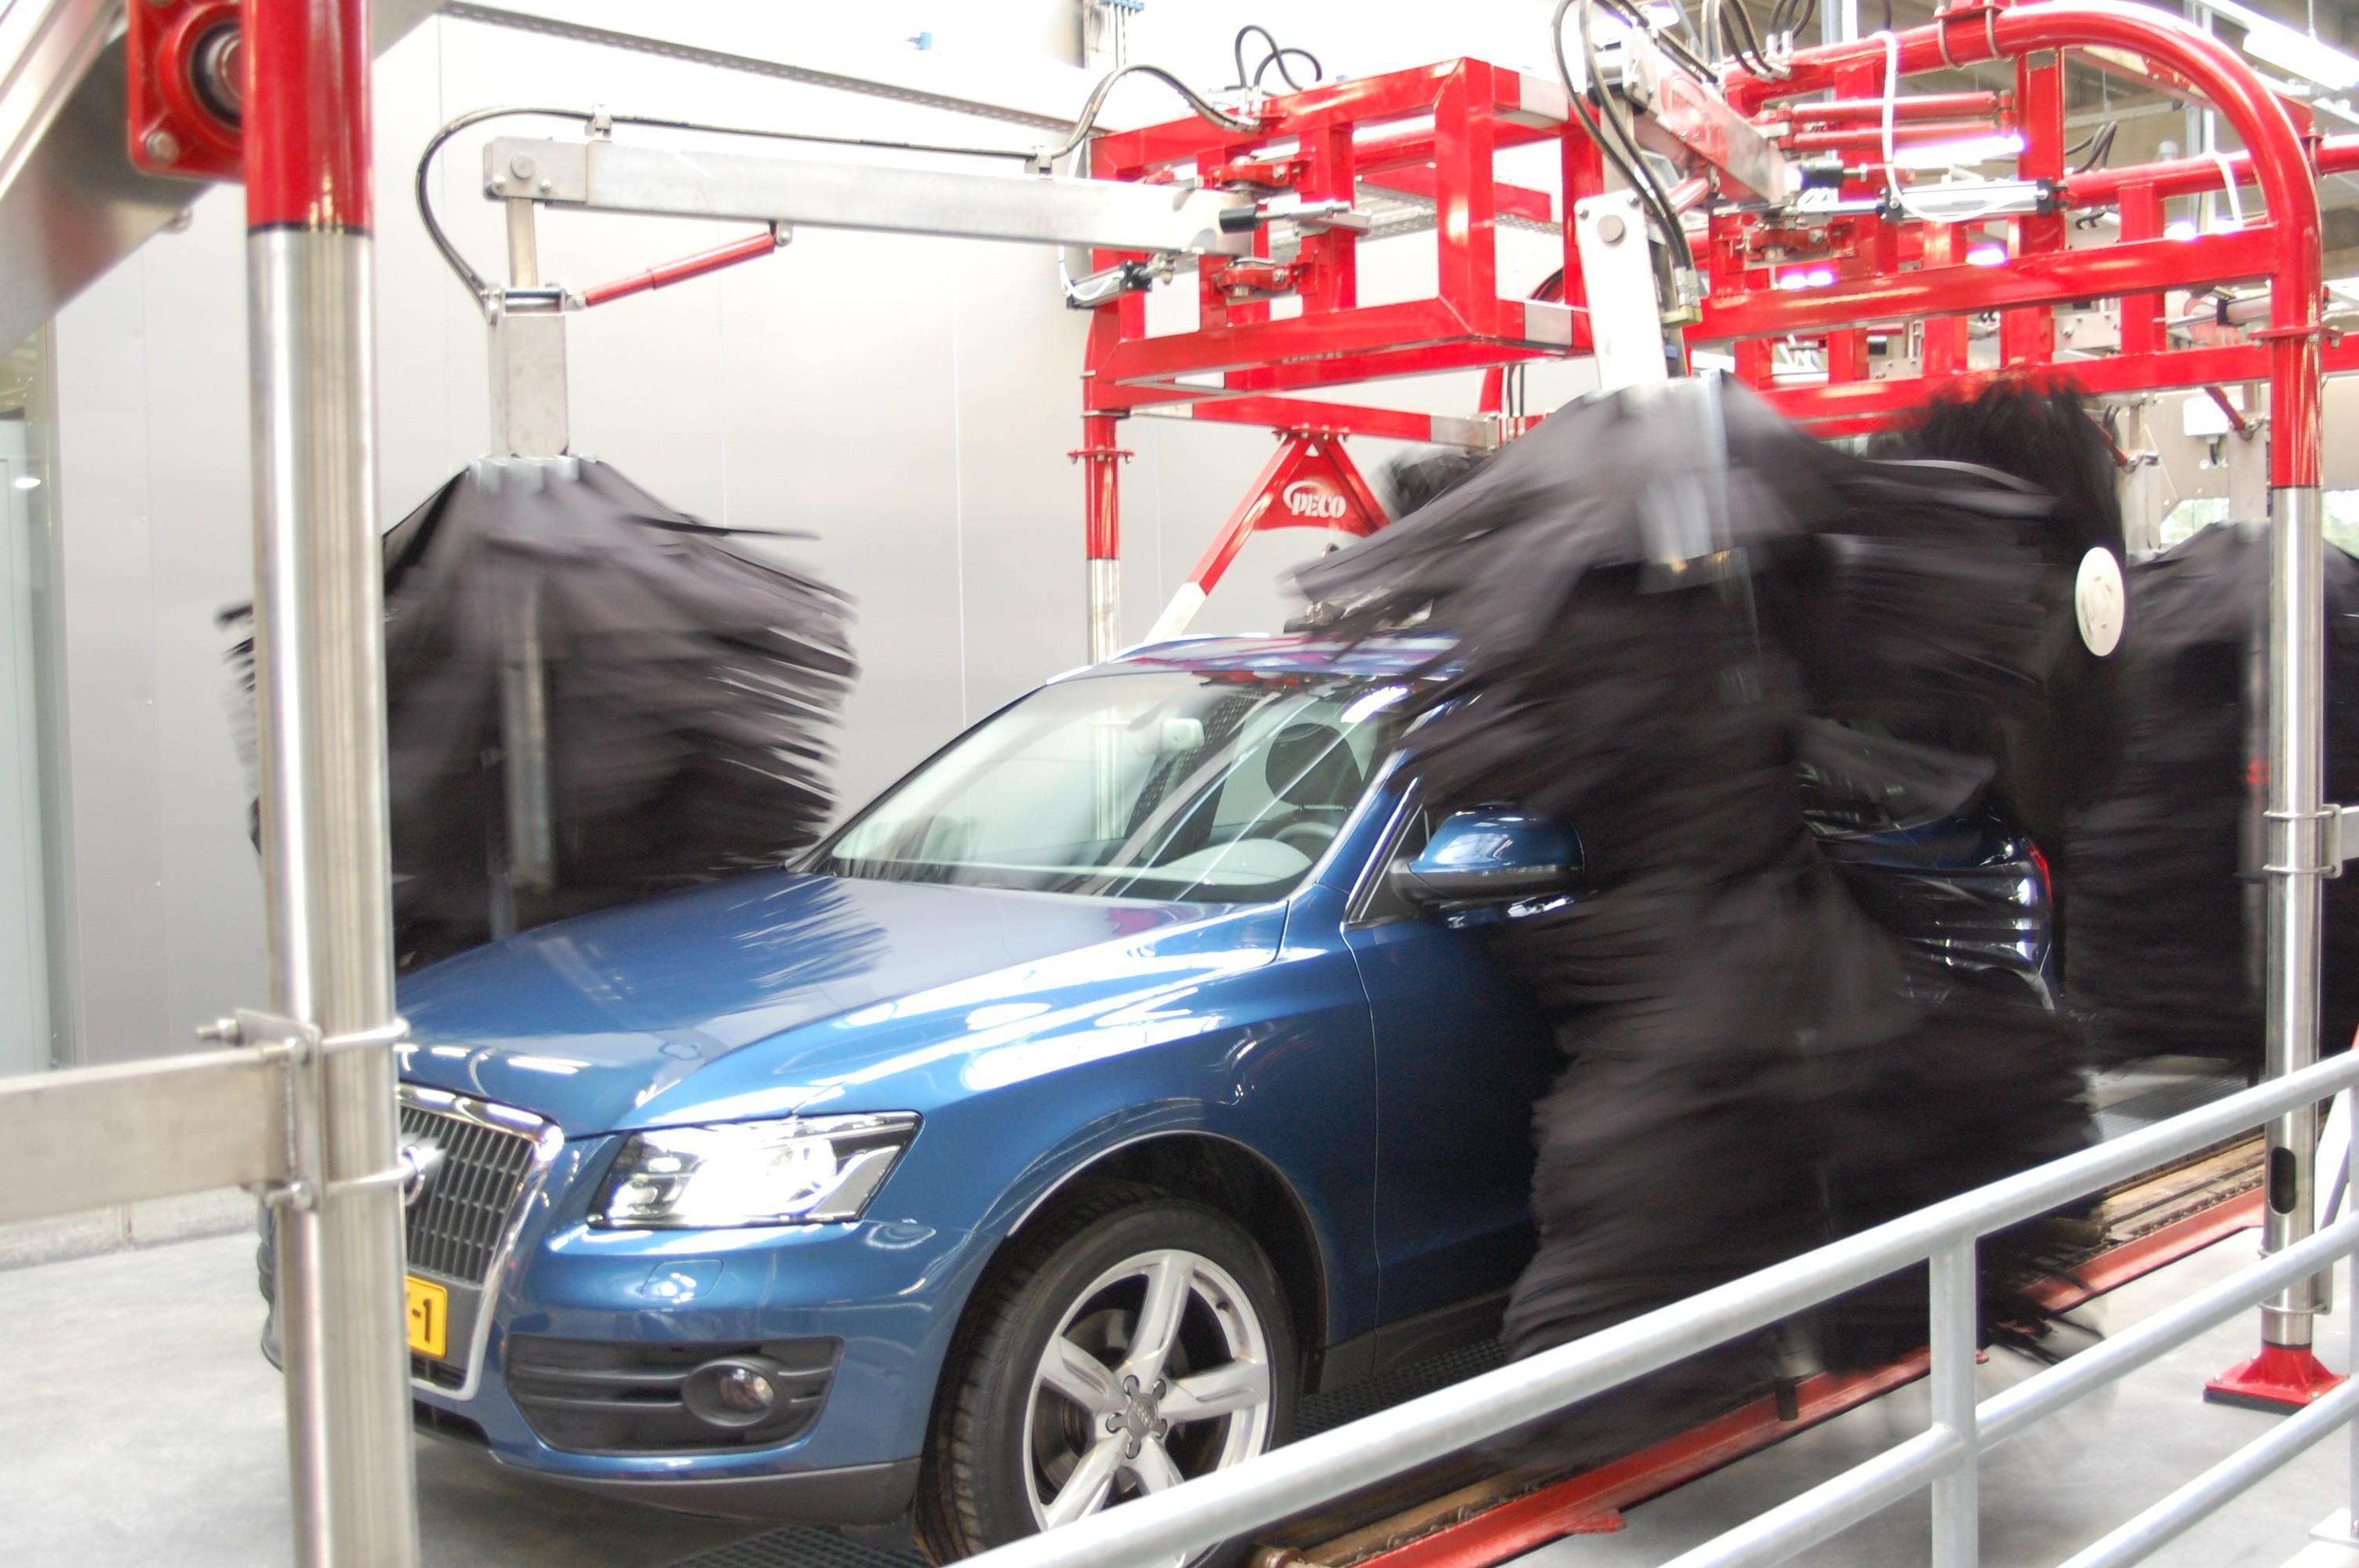 Peco Car Wash Systems Linkedin